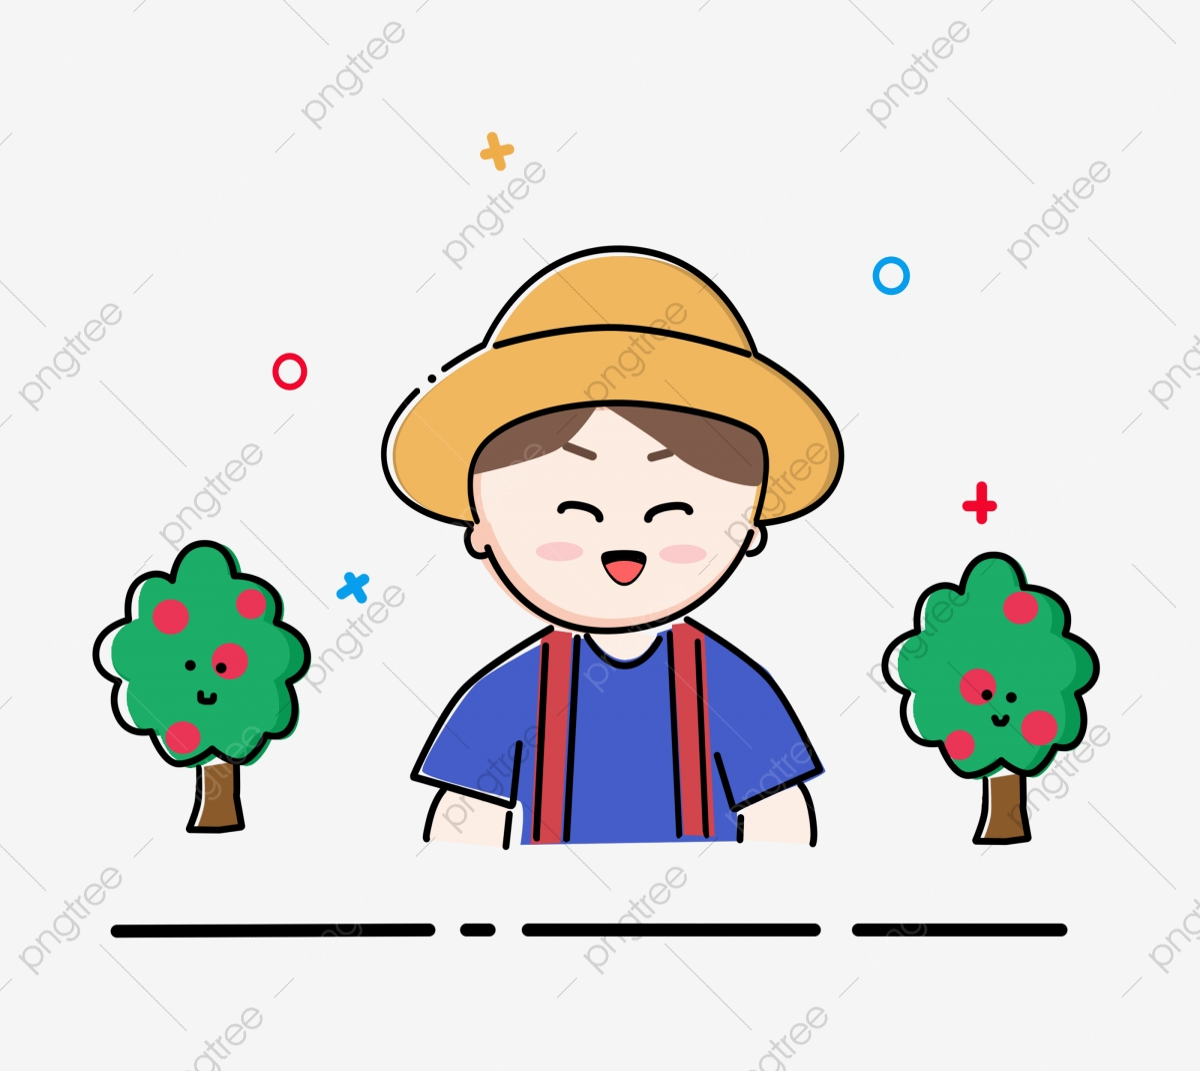 Vector Clipart - Happy farmer. Vector Illustration gg68519078 - GoGraph